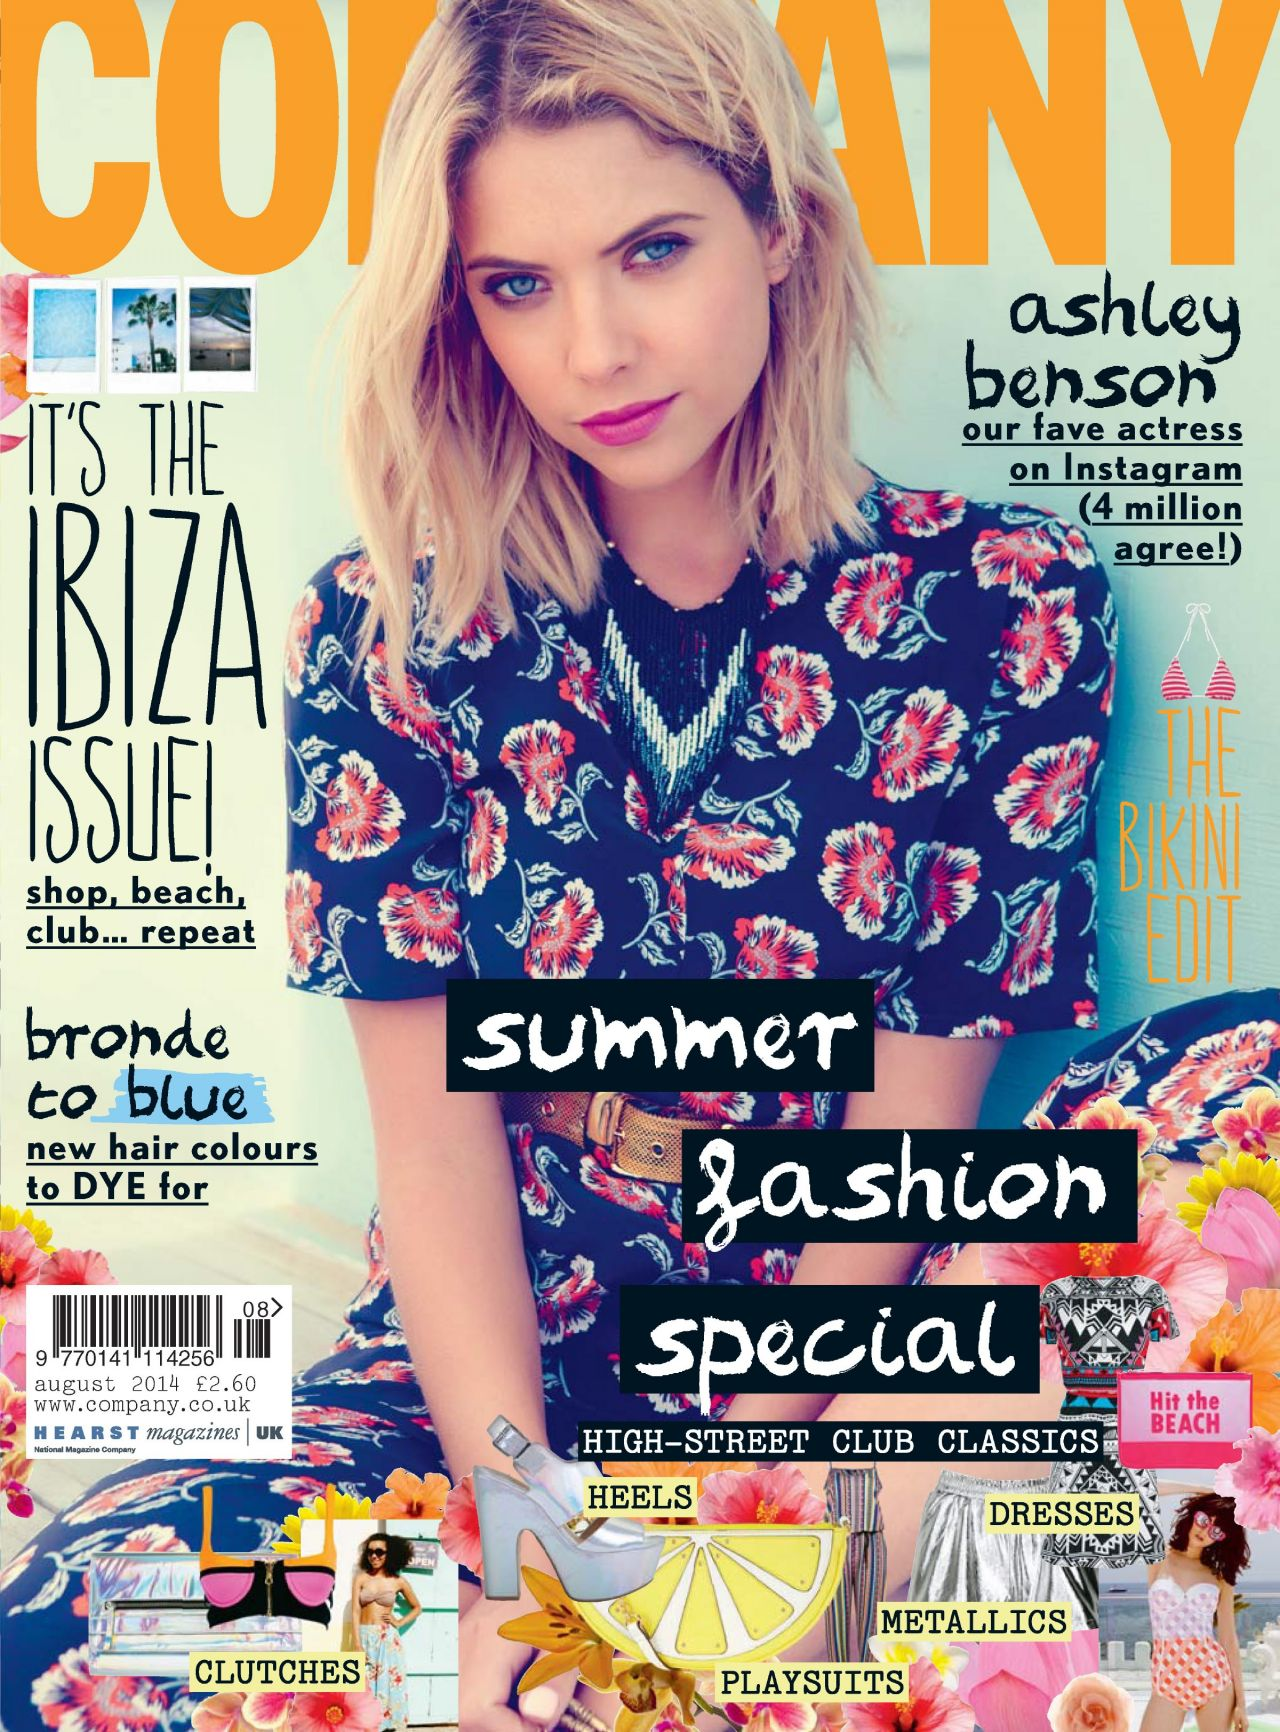 Ashley Benson - Company Magazine (UK) - August 2014 Cover